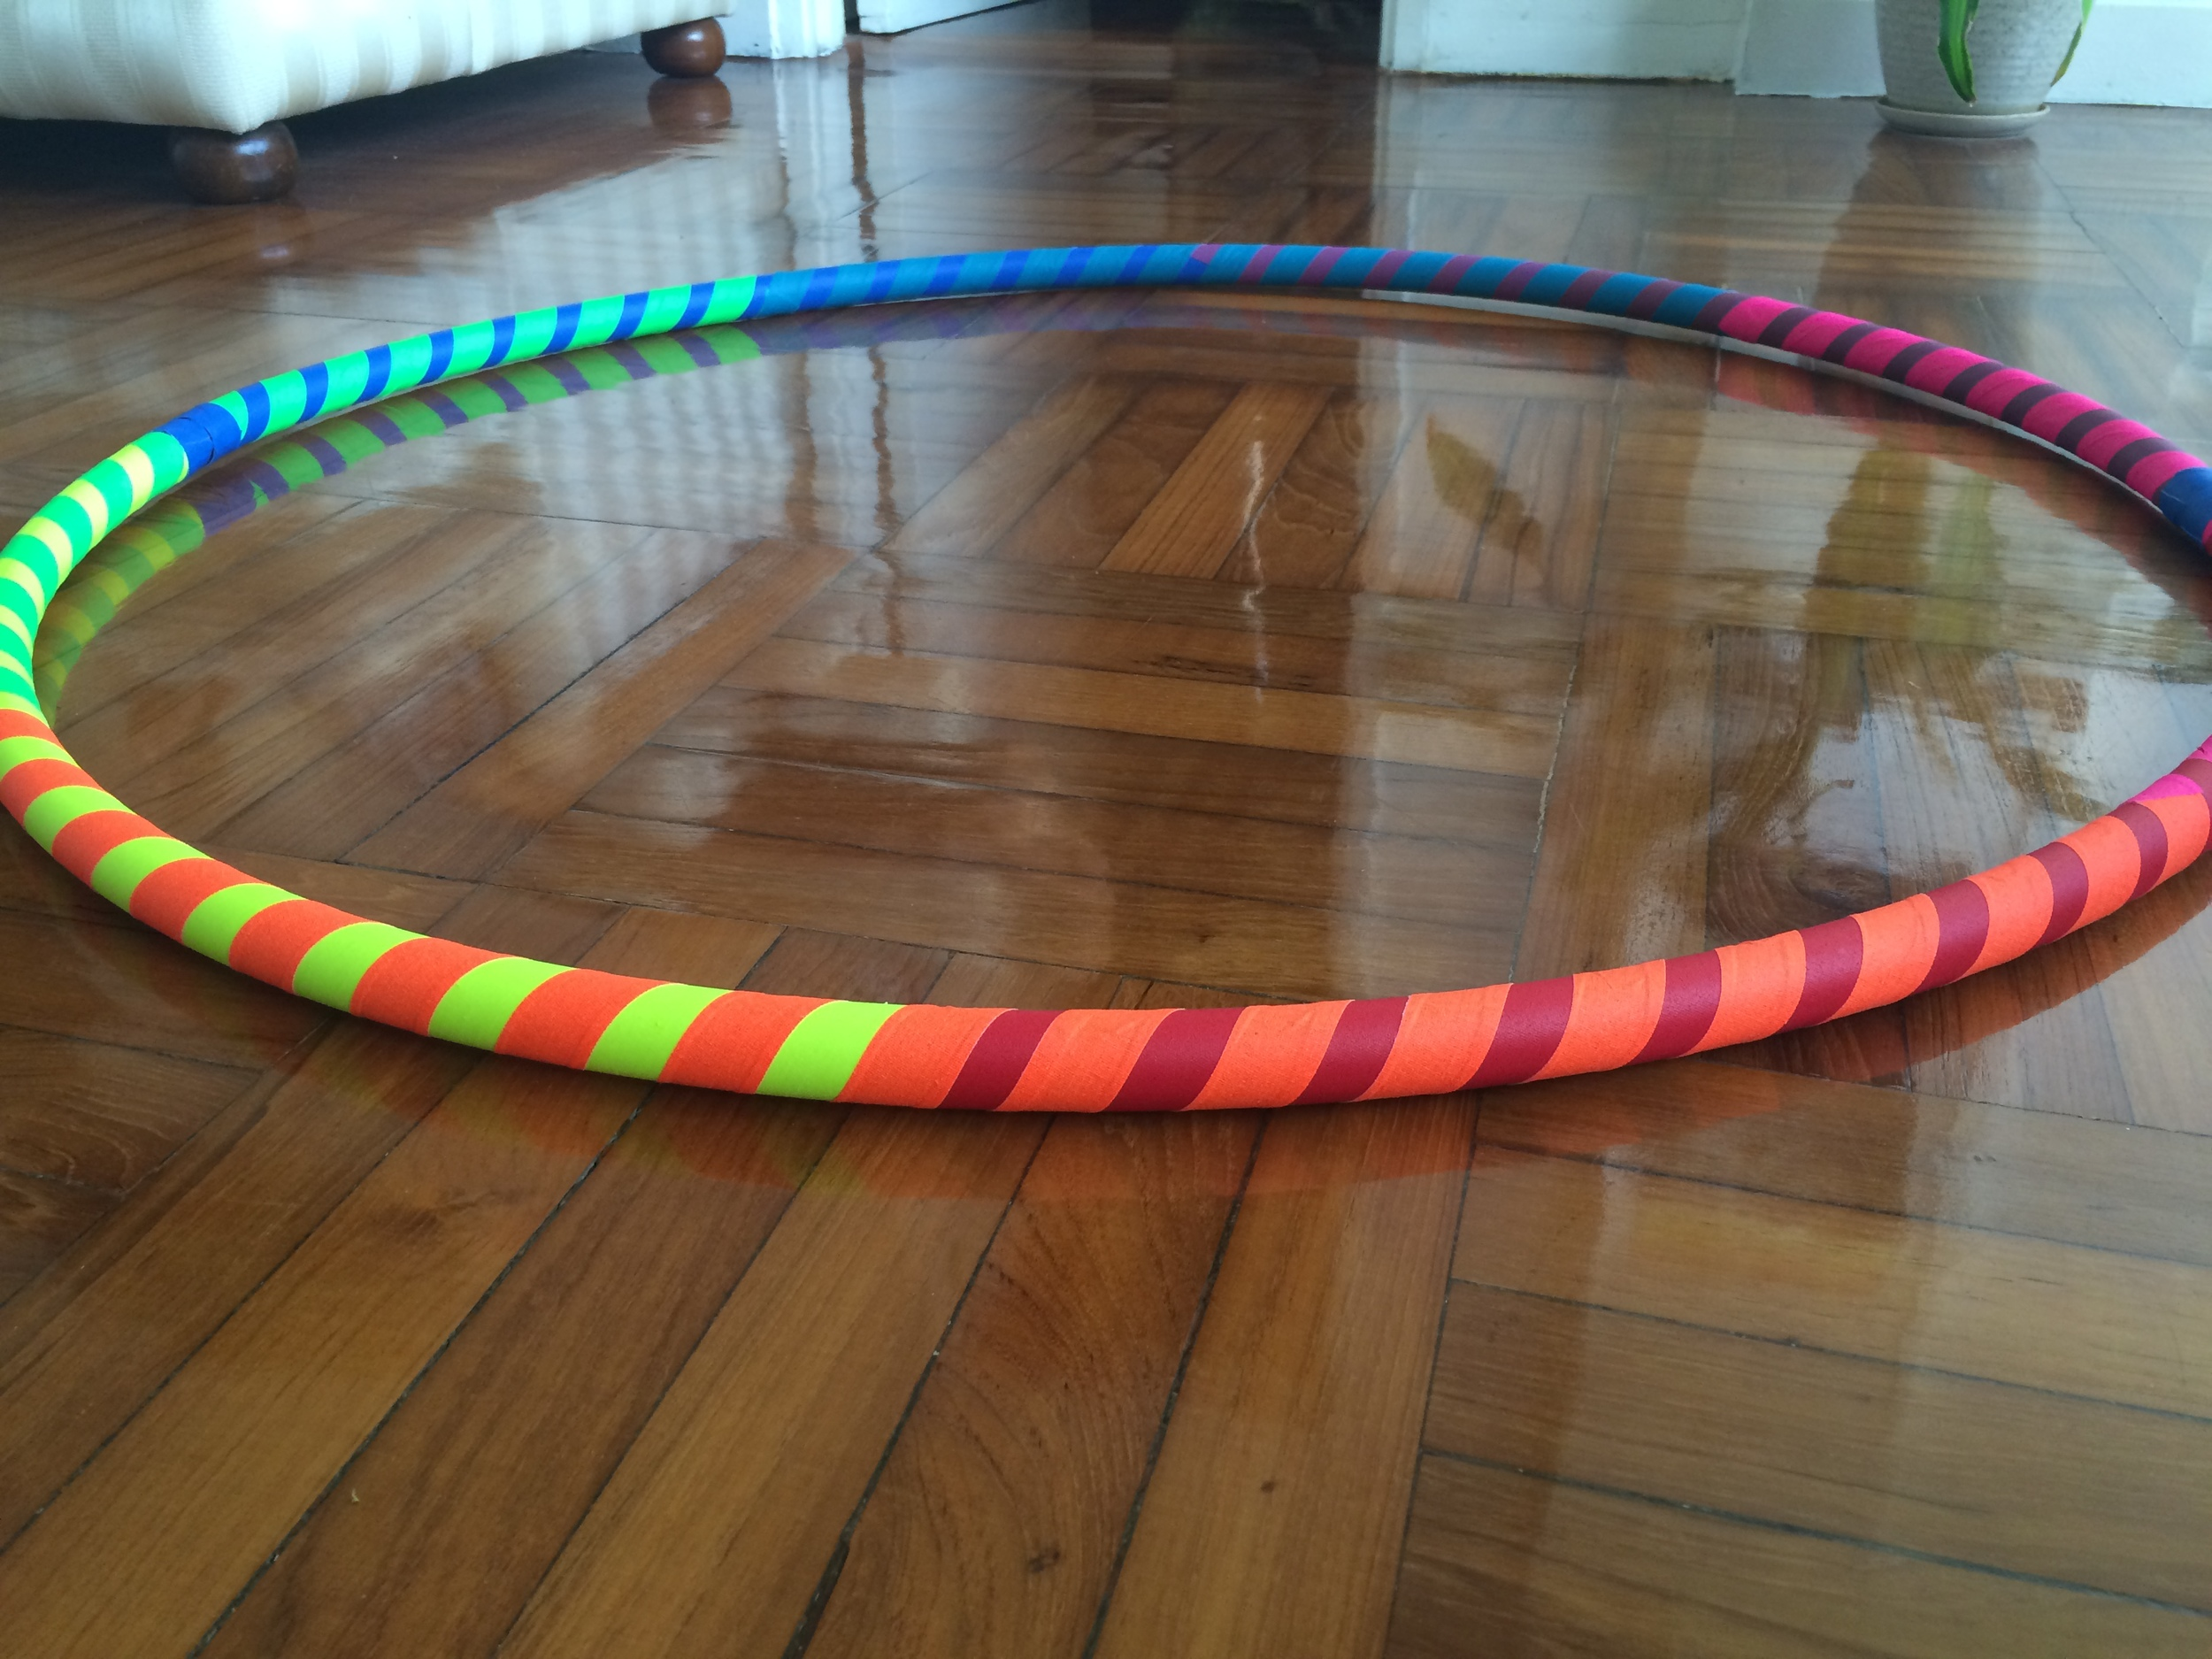 hula hoop hong kong buy 香港呼啦圈選購